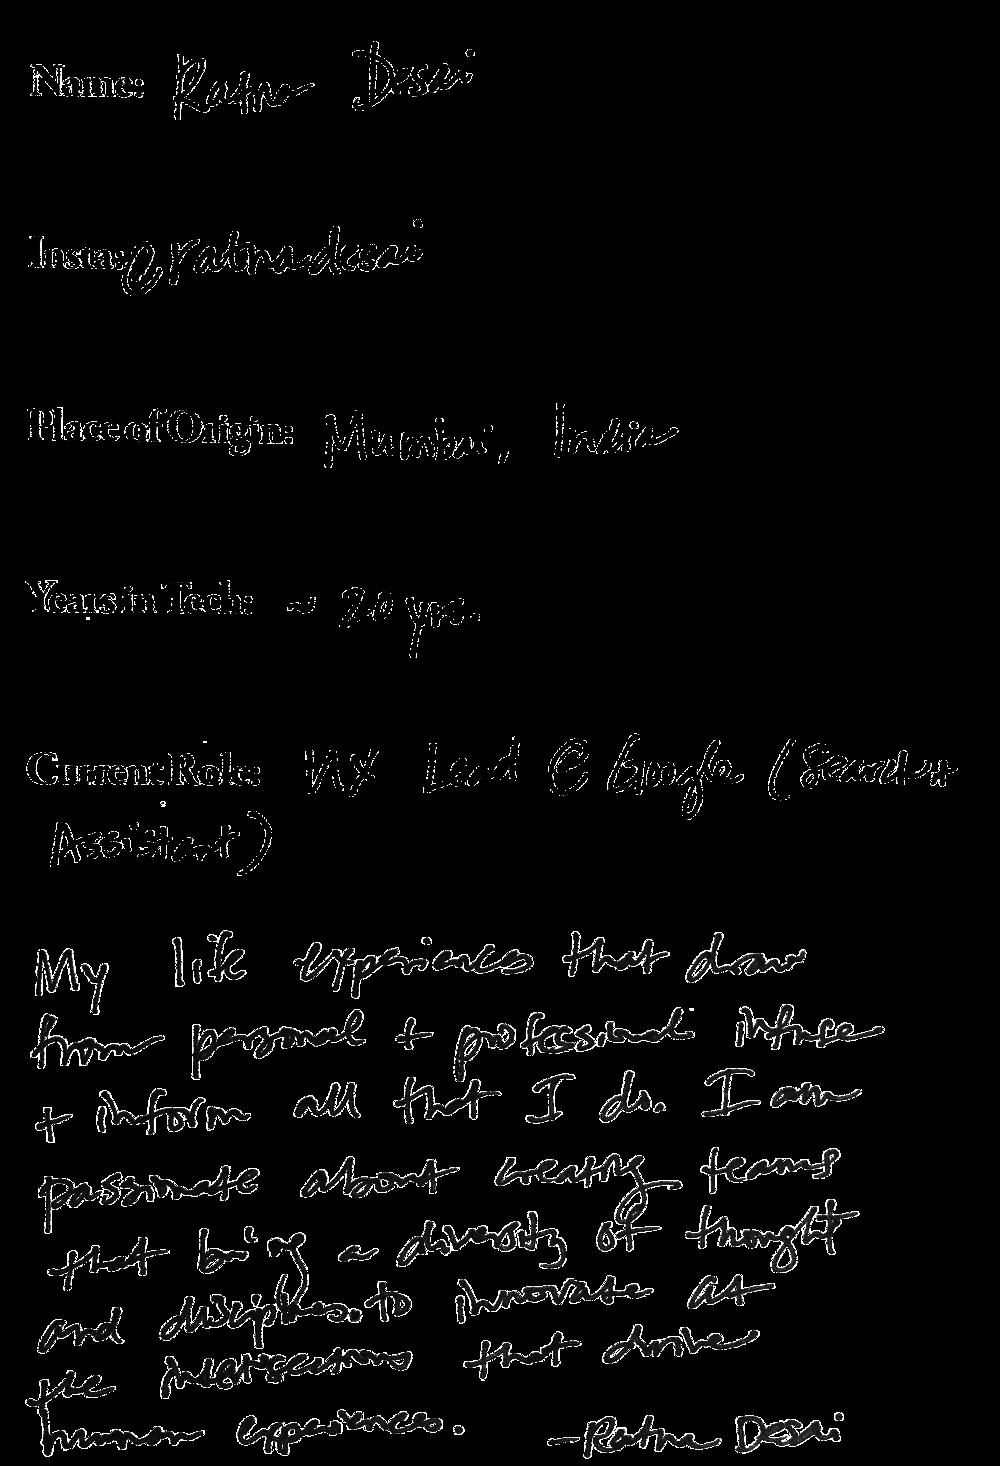 Ratna Desai - 04.jpg